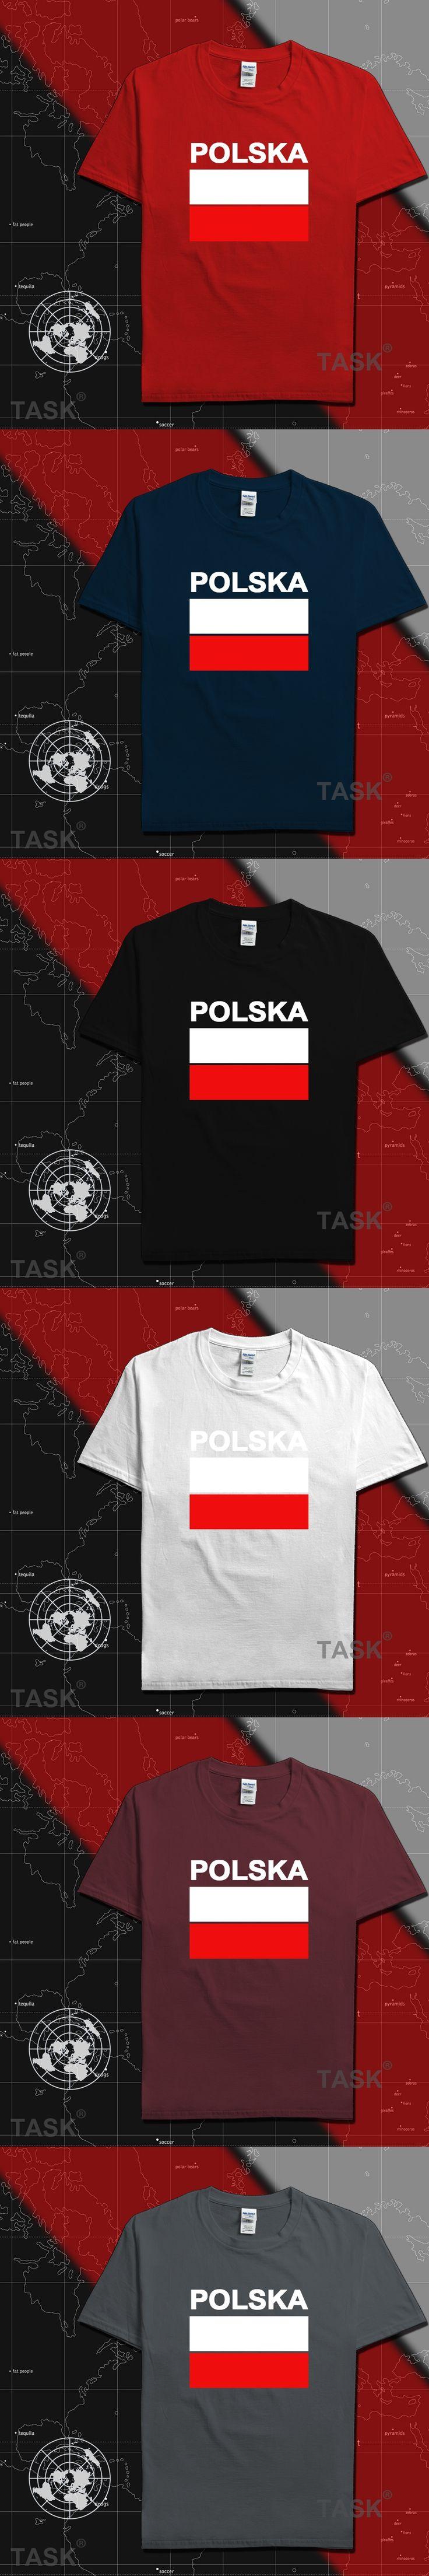 Poland men t shirts Polish POLE 2017 jerseys hip hop nations cotton t-shirt fitness footballs tees country POLAK flags Polska